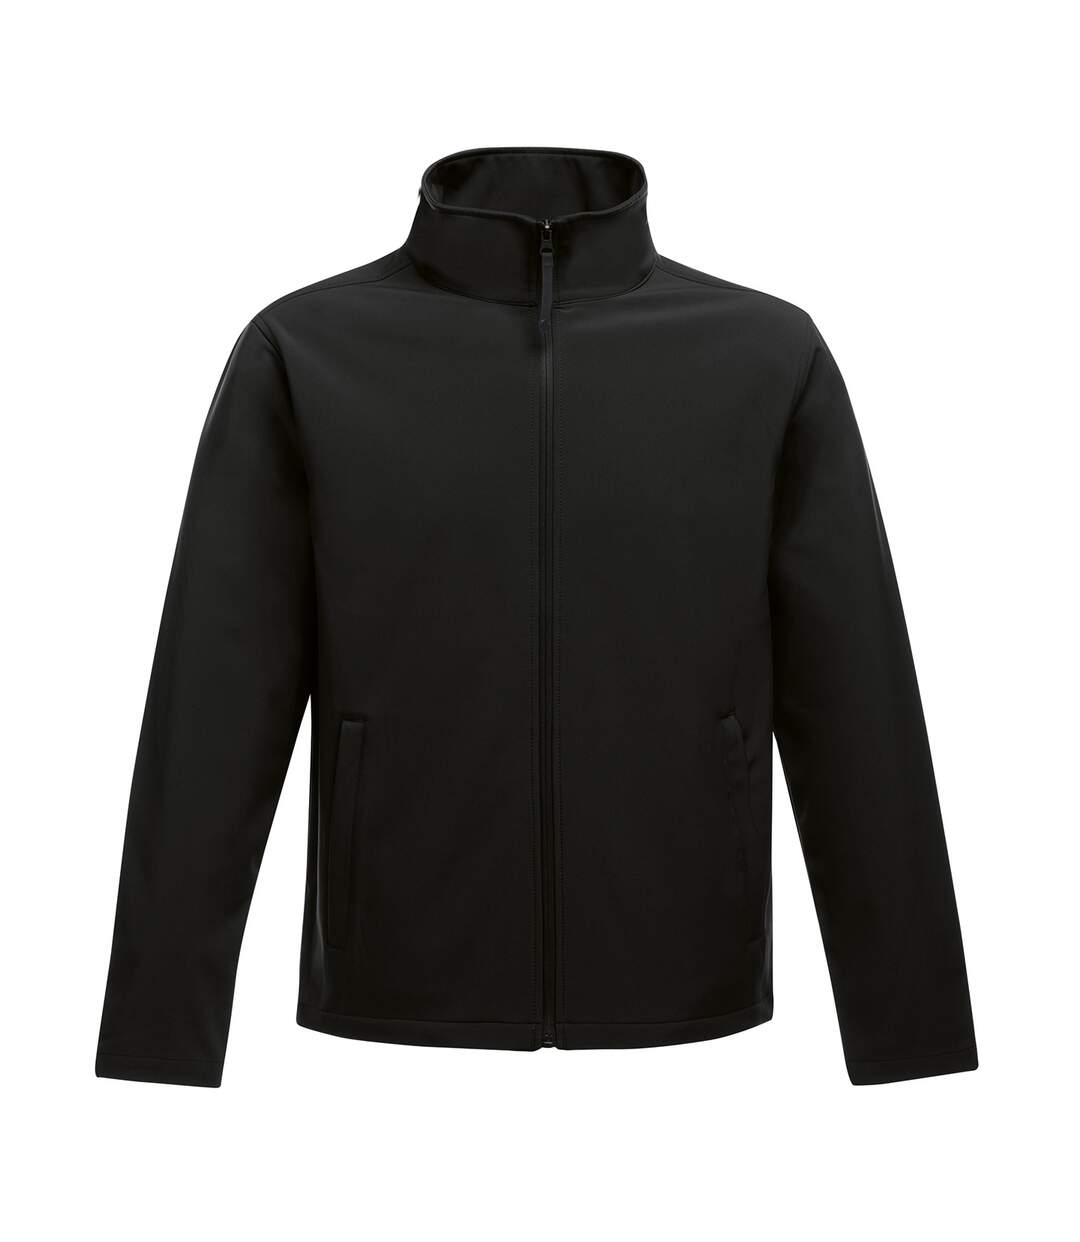 Regatta Standout Mens Ablaze Printable Softshell Jacket (Classic Red/Black) - UTRW6353